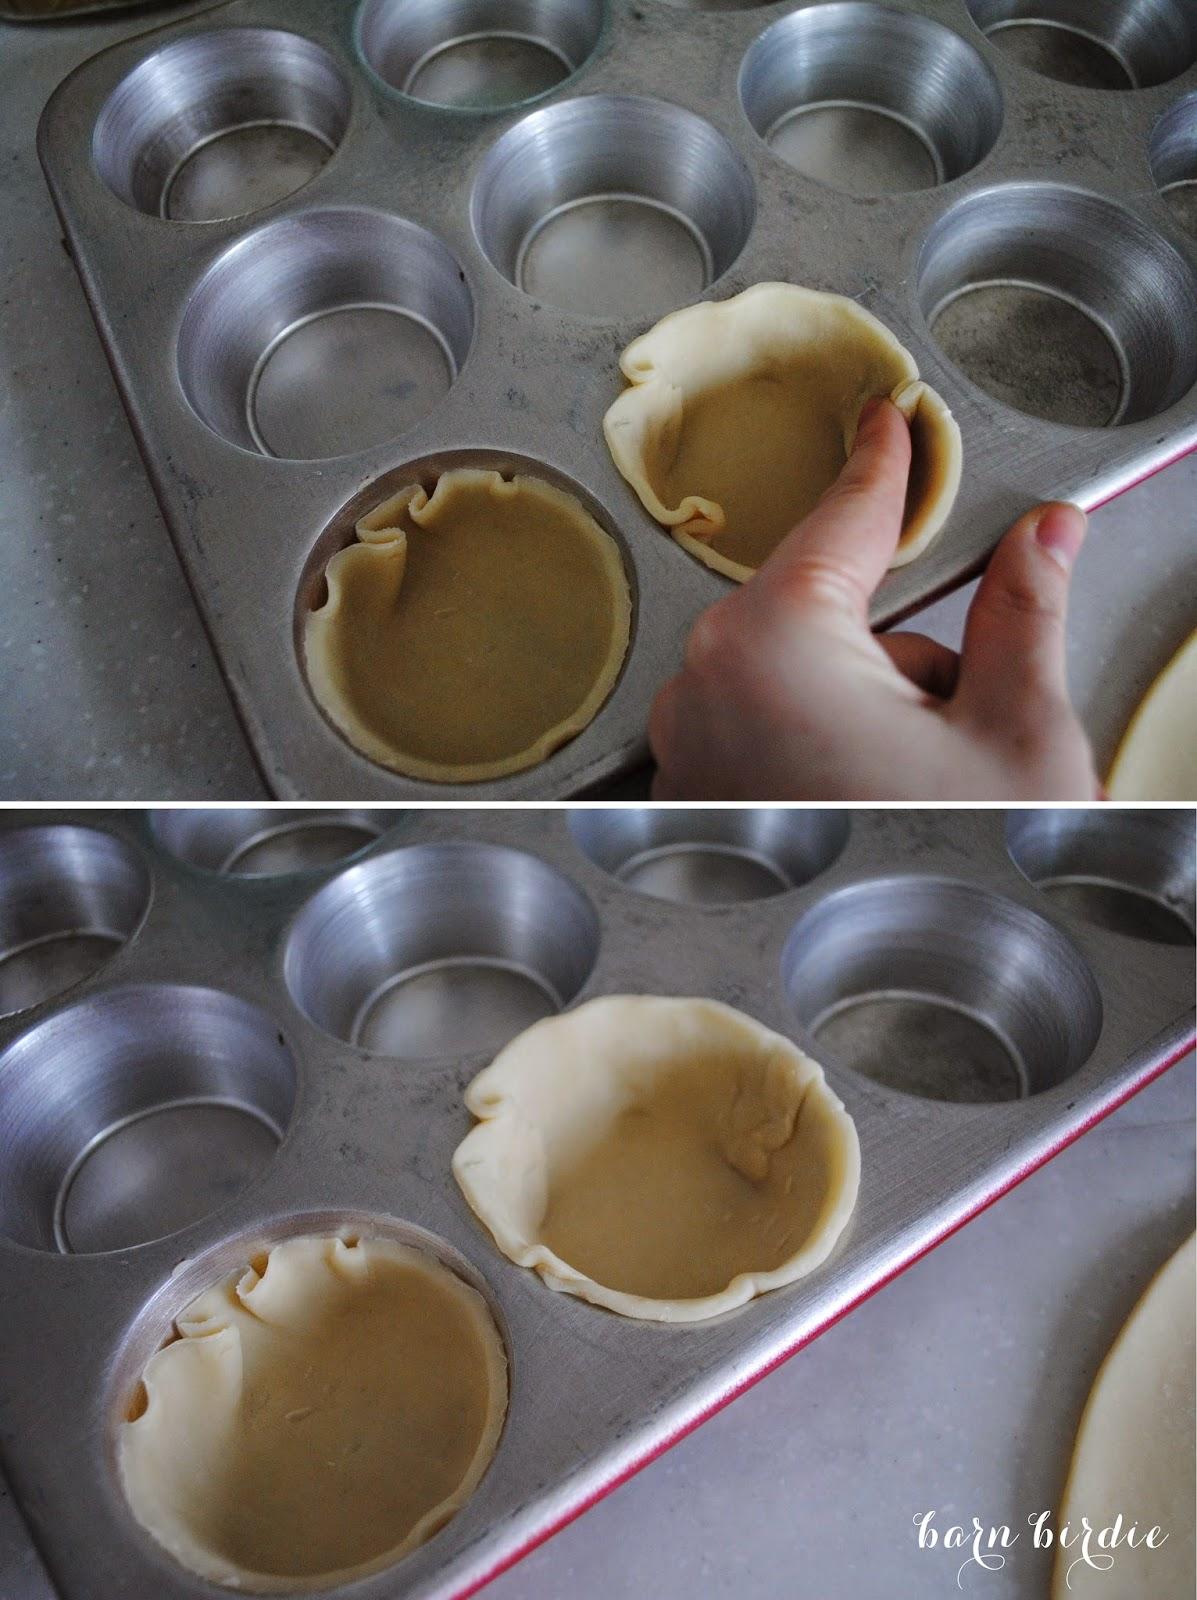 Delicious Mini Pies